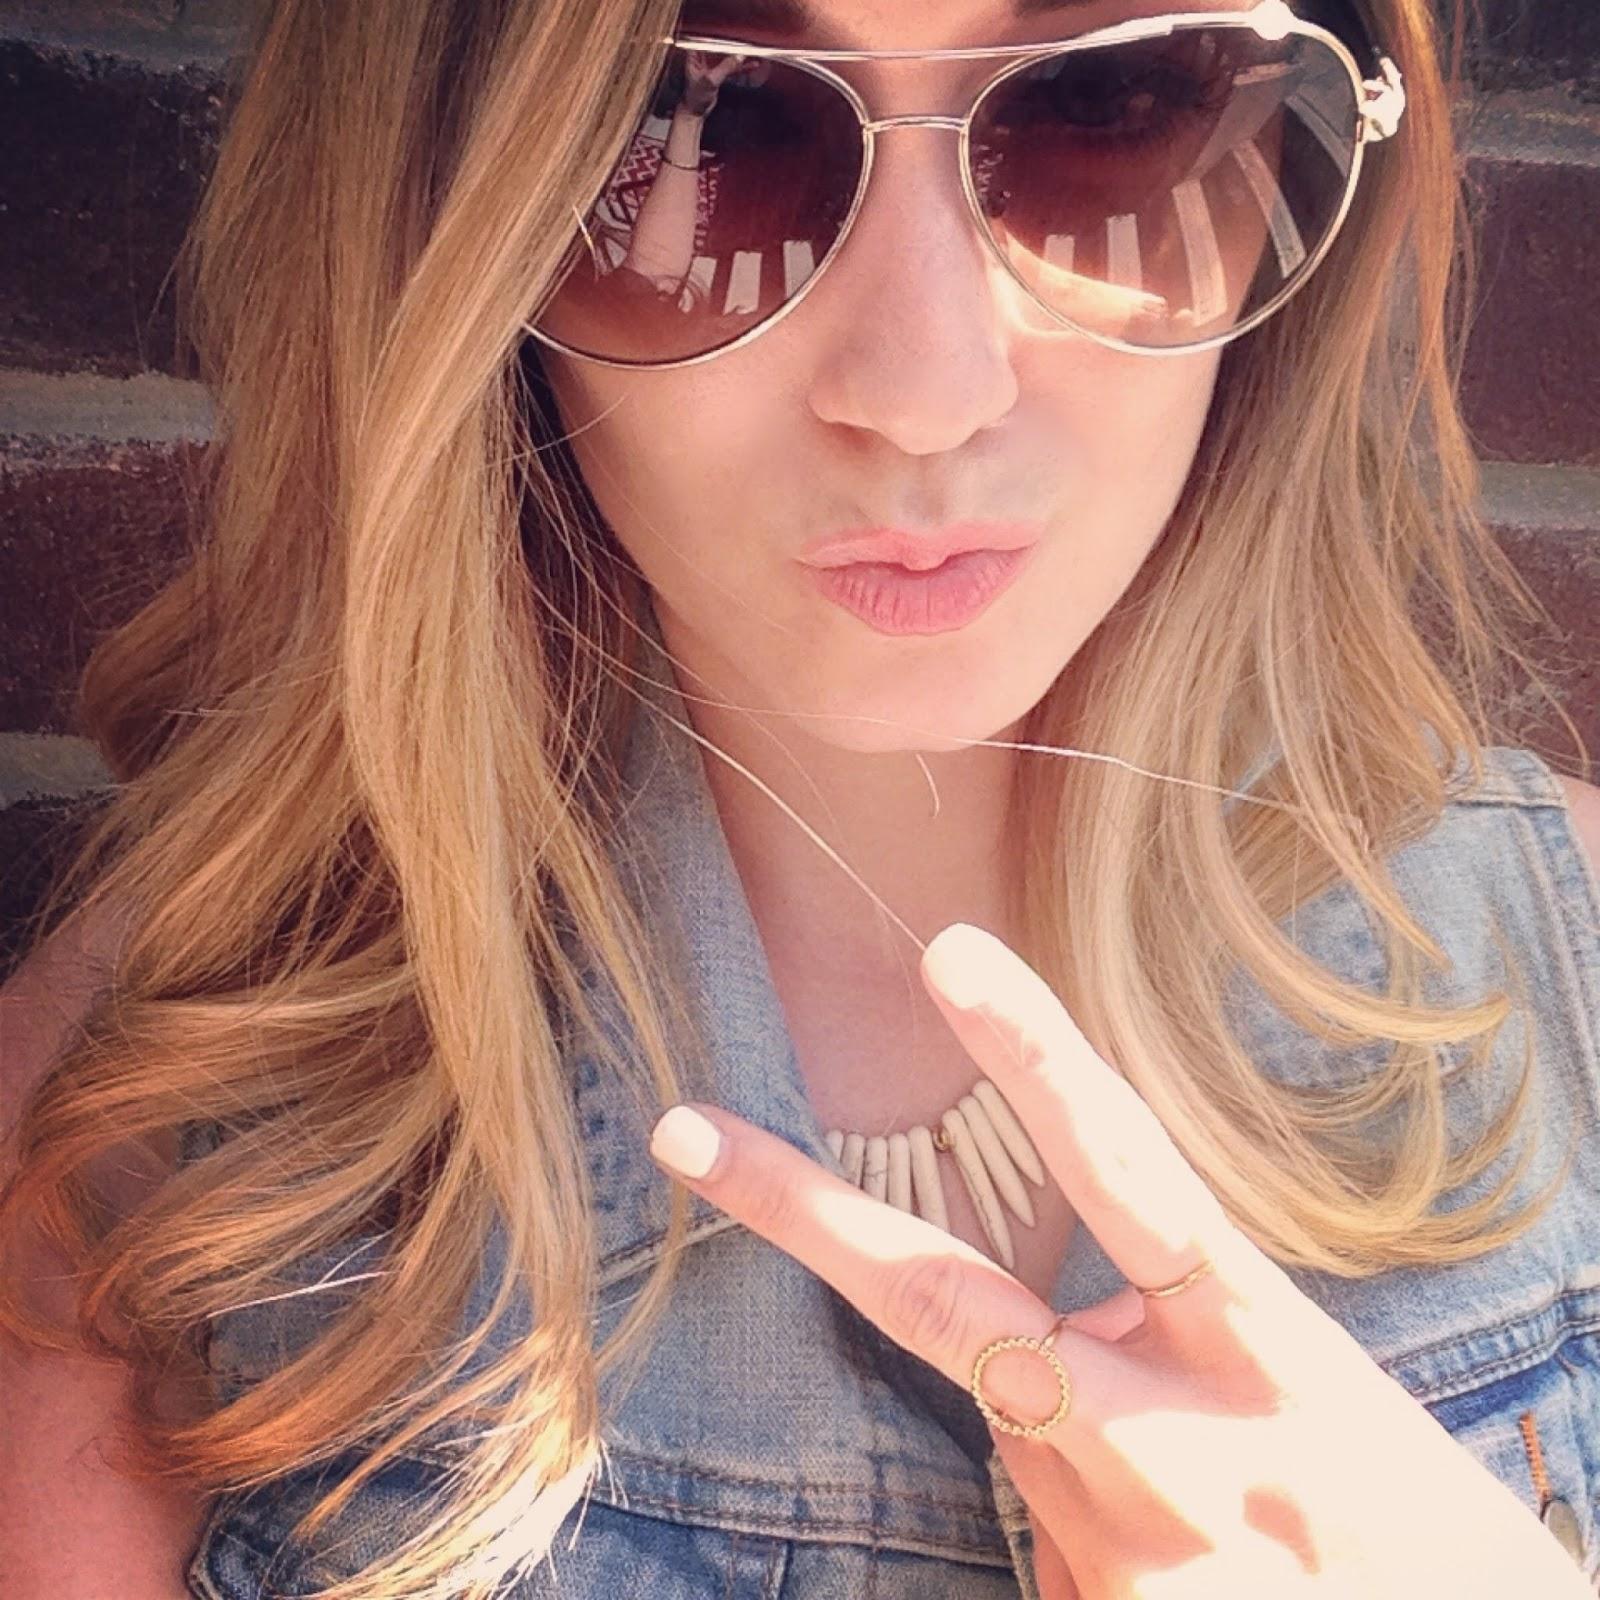 girl 👧 magic ☄ selfie time smile hair lipstick makeup